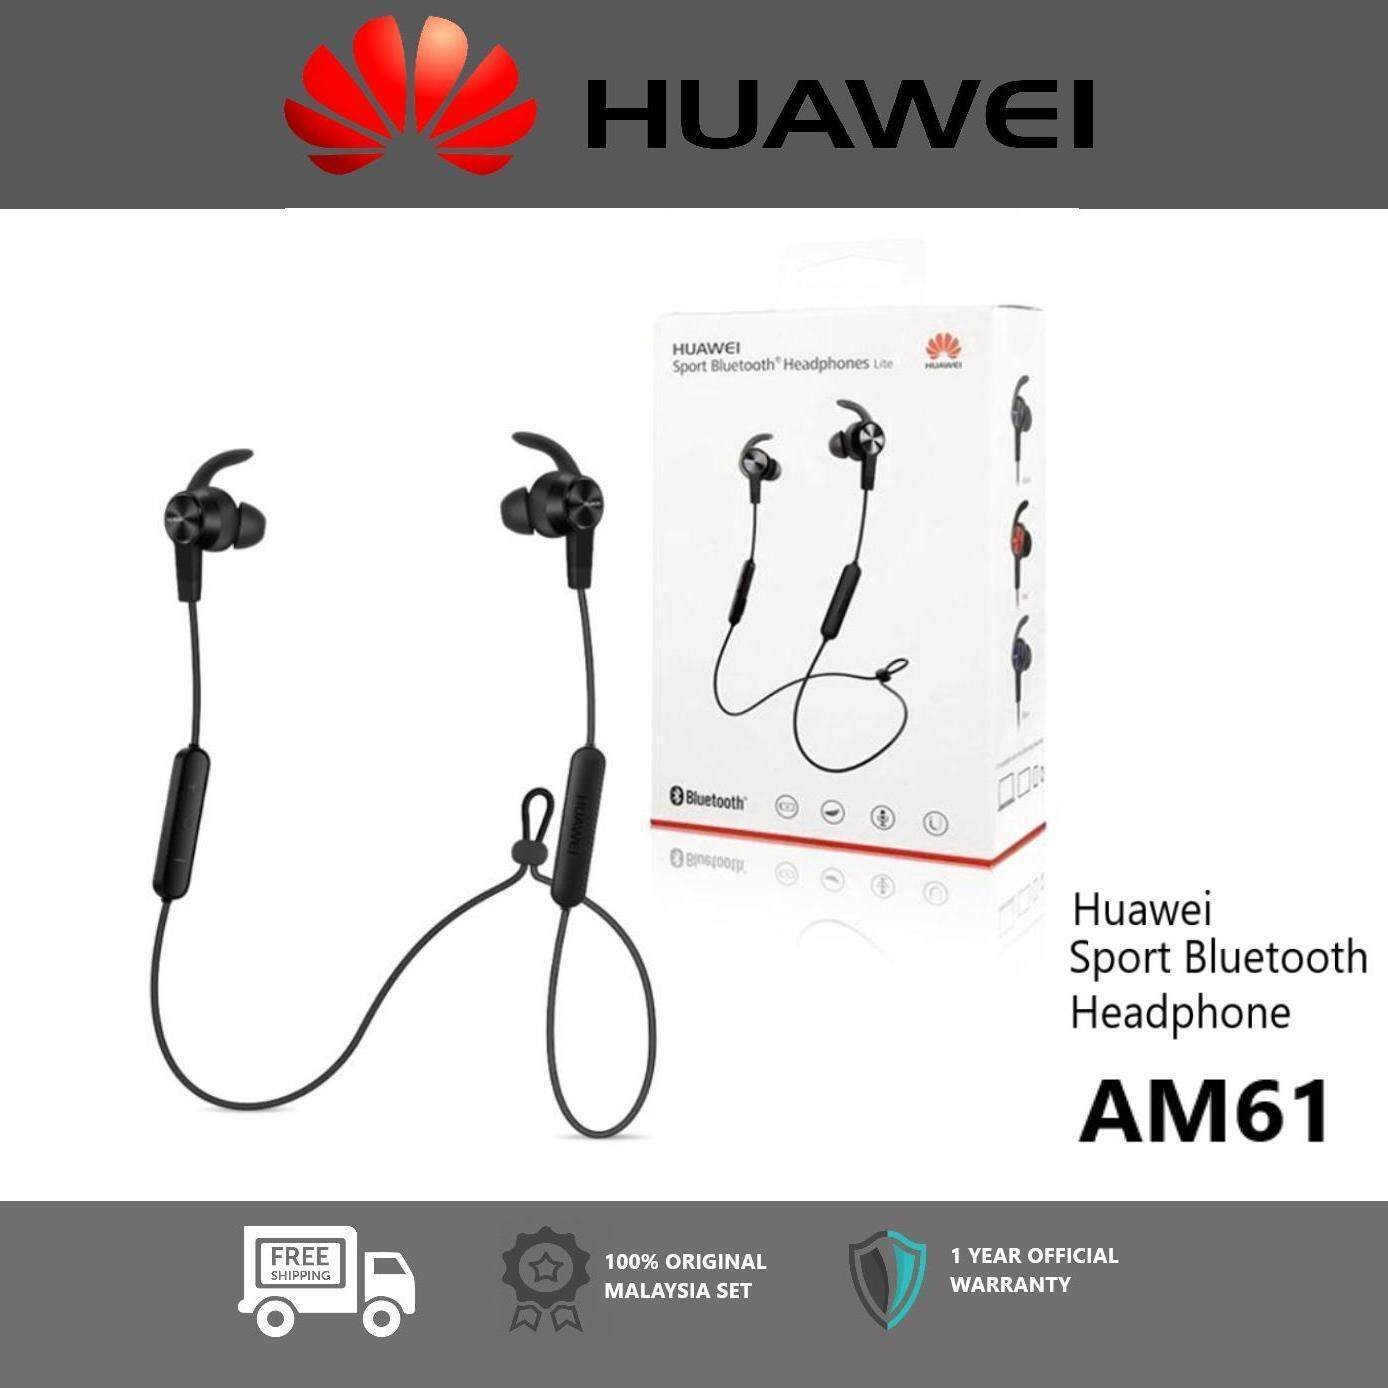 053302608db Huawei Headphones & Headsets price in Malaysia - Best Huawei ...